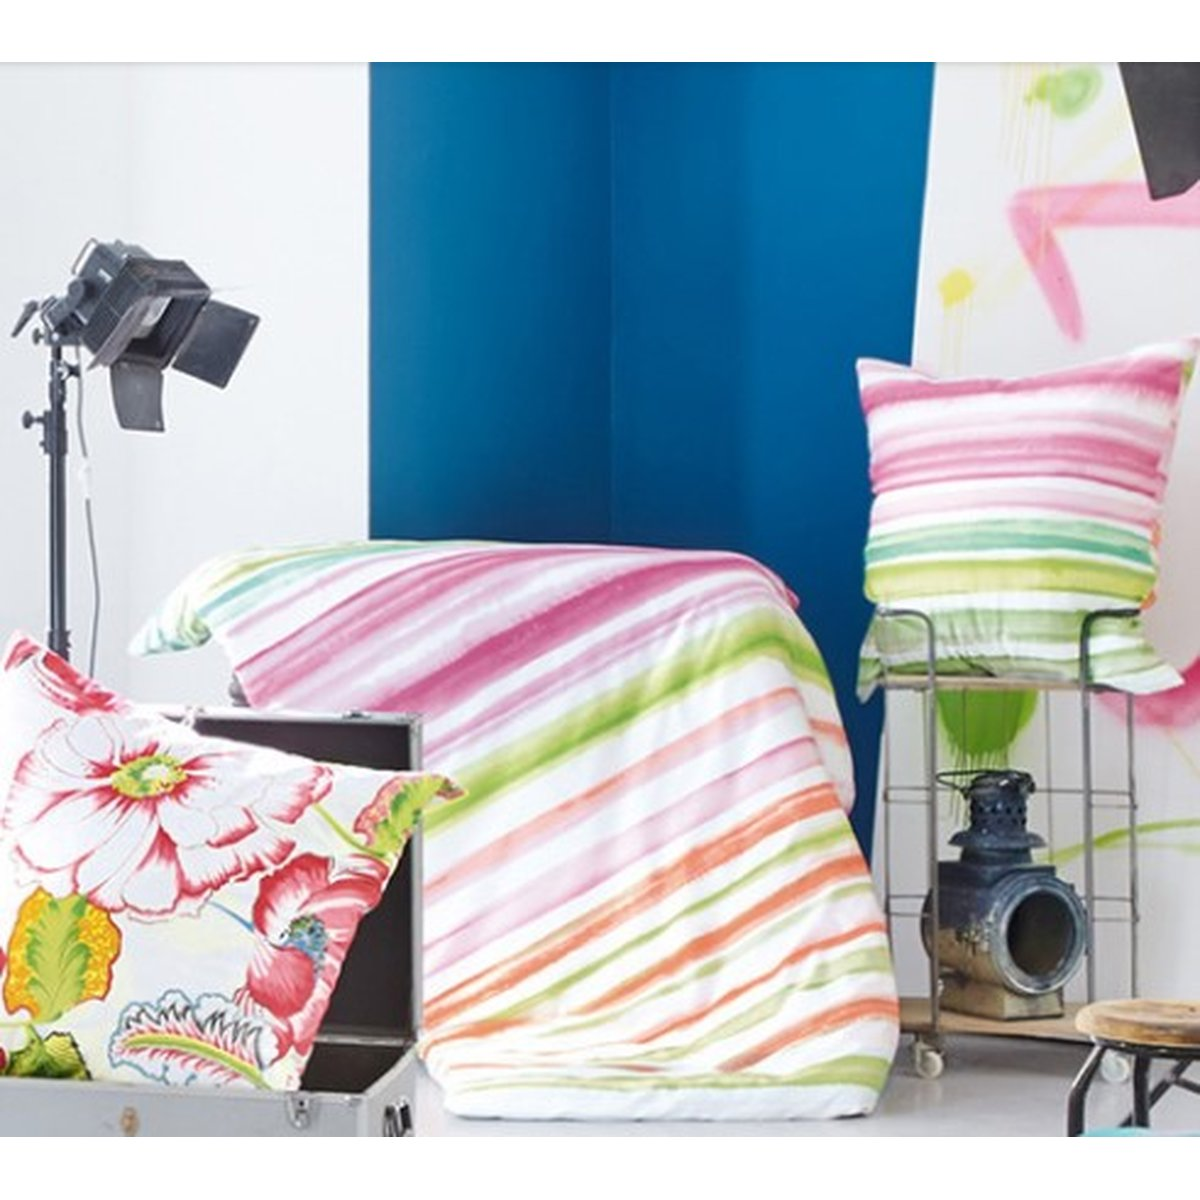 living dreams satin bettw sche wohntraum 24. Black Bedroom Furniture Sets. Home Design Ideas